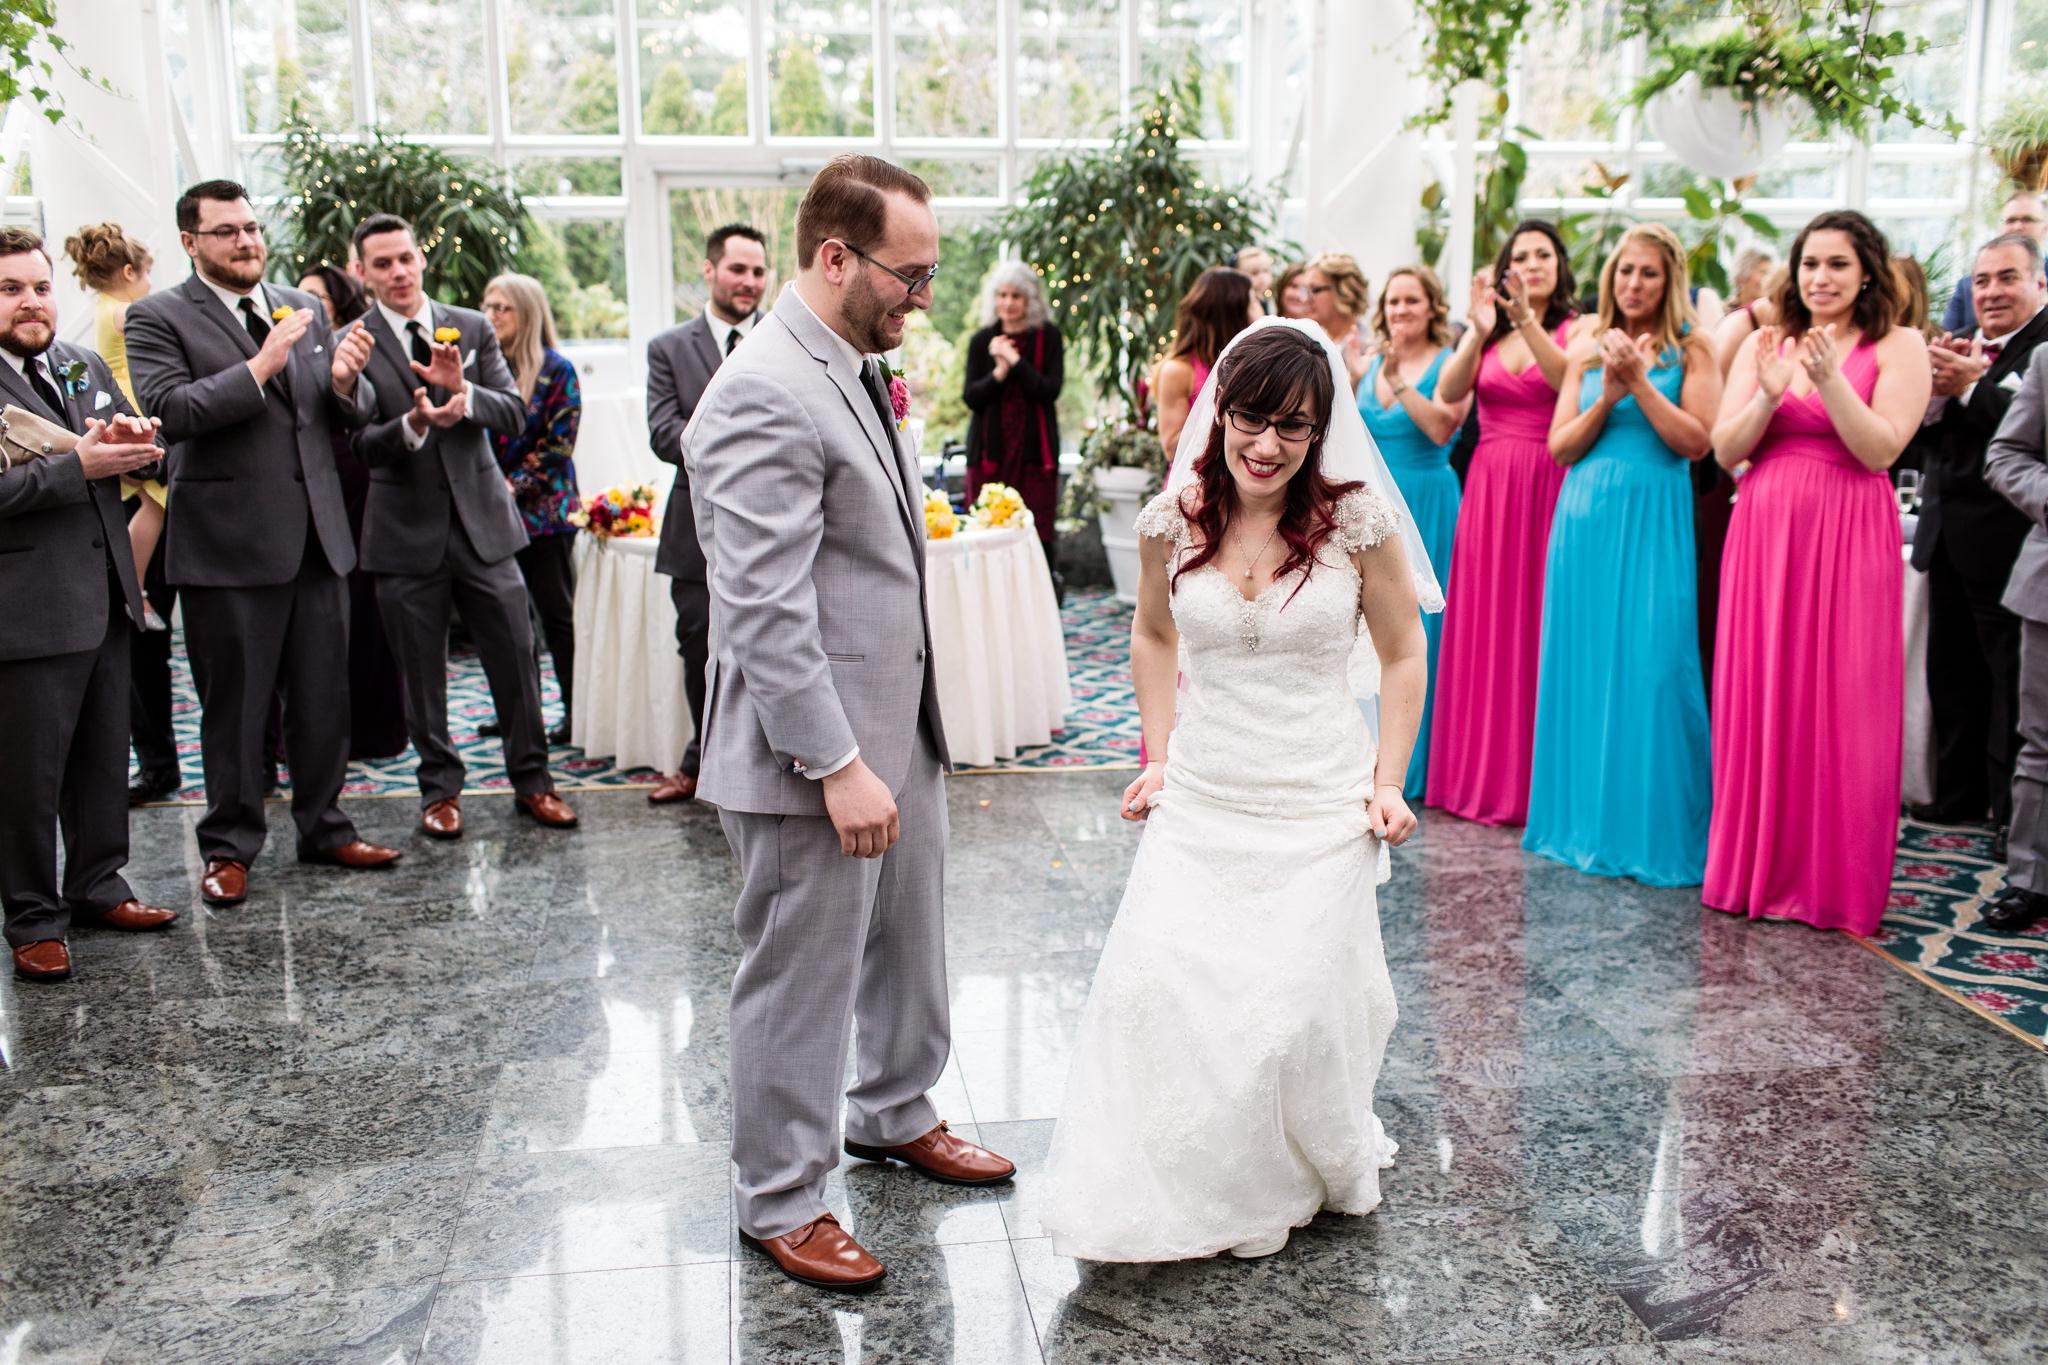 Hanchar_Madison_Hotel_NJ_Wedding_7R5A8790.jpg